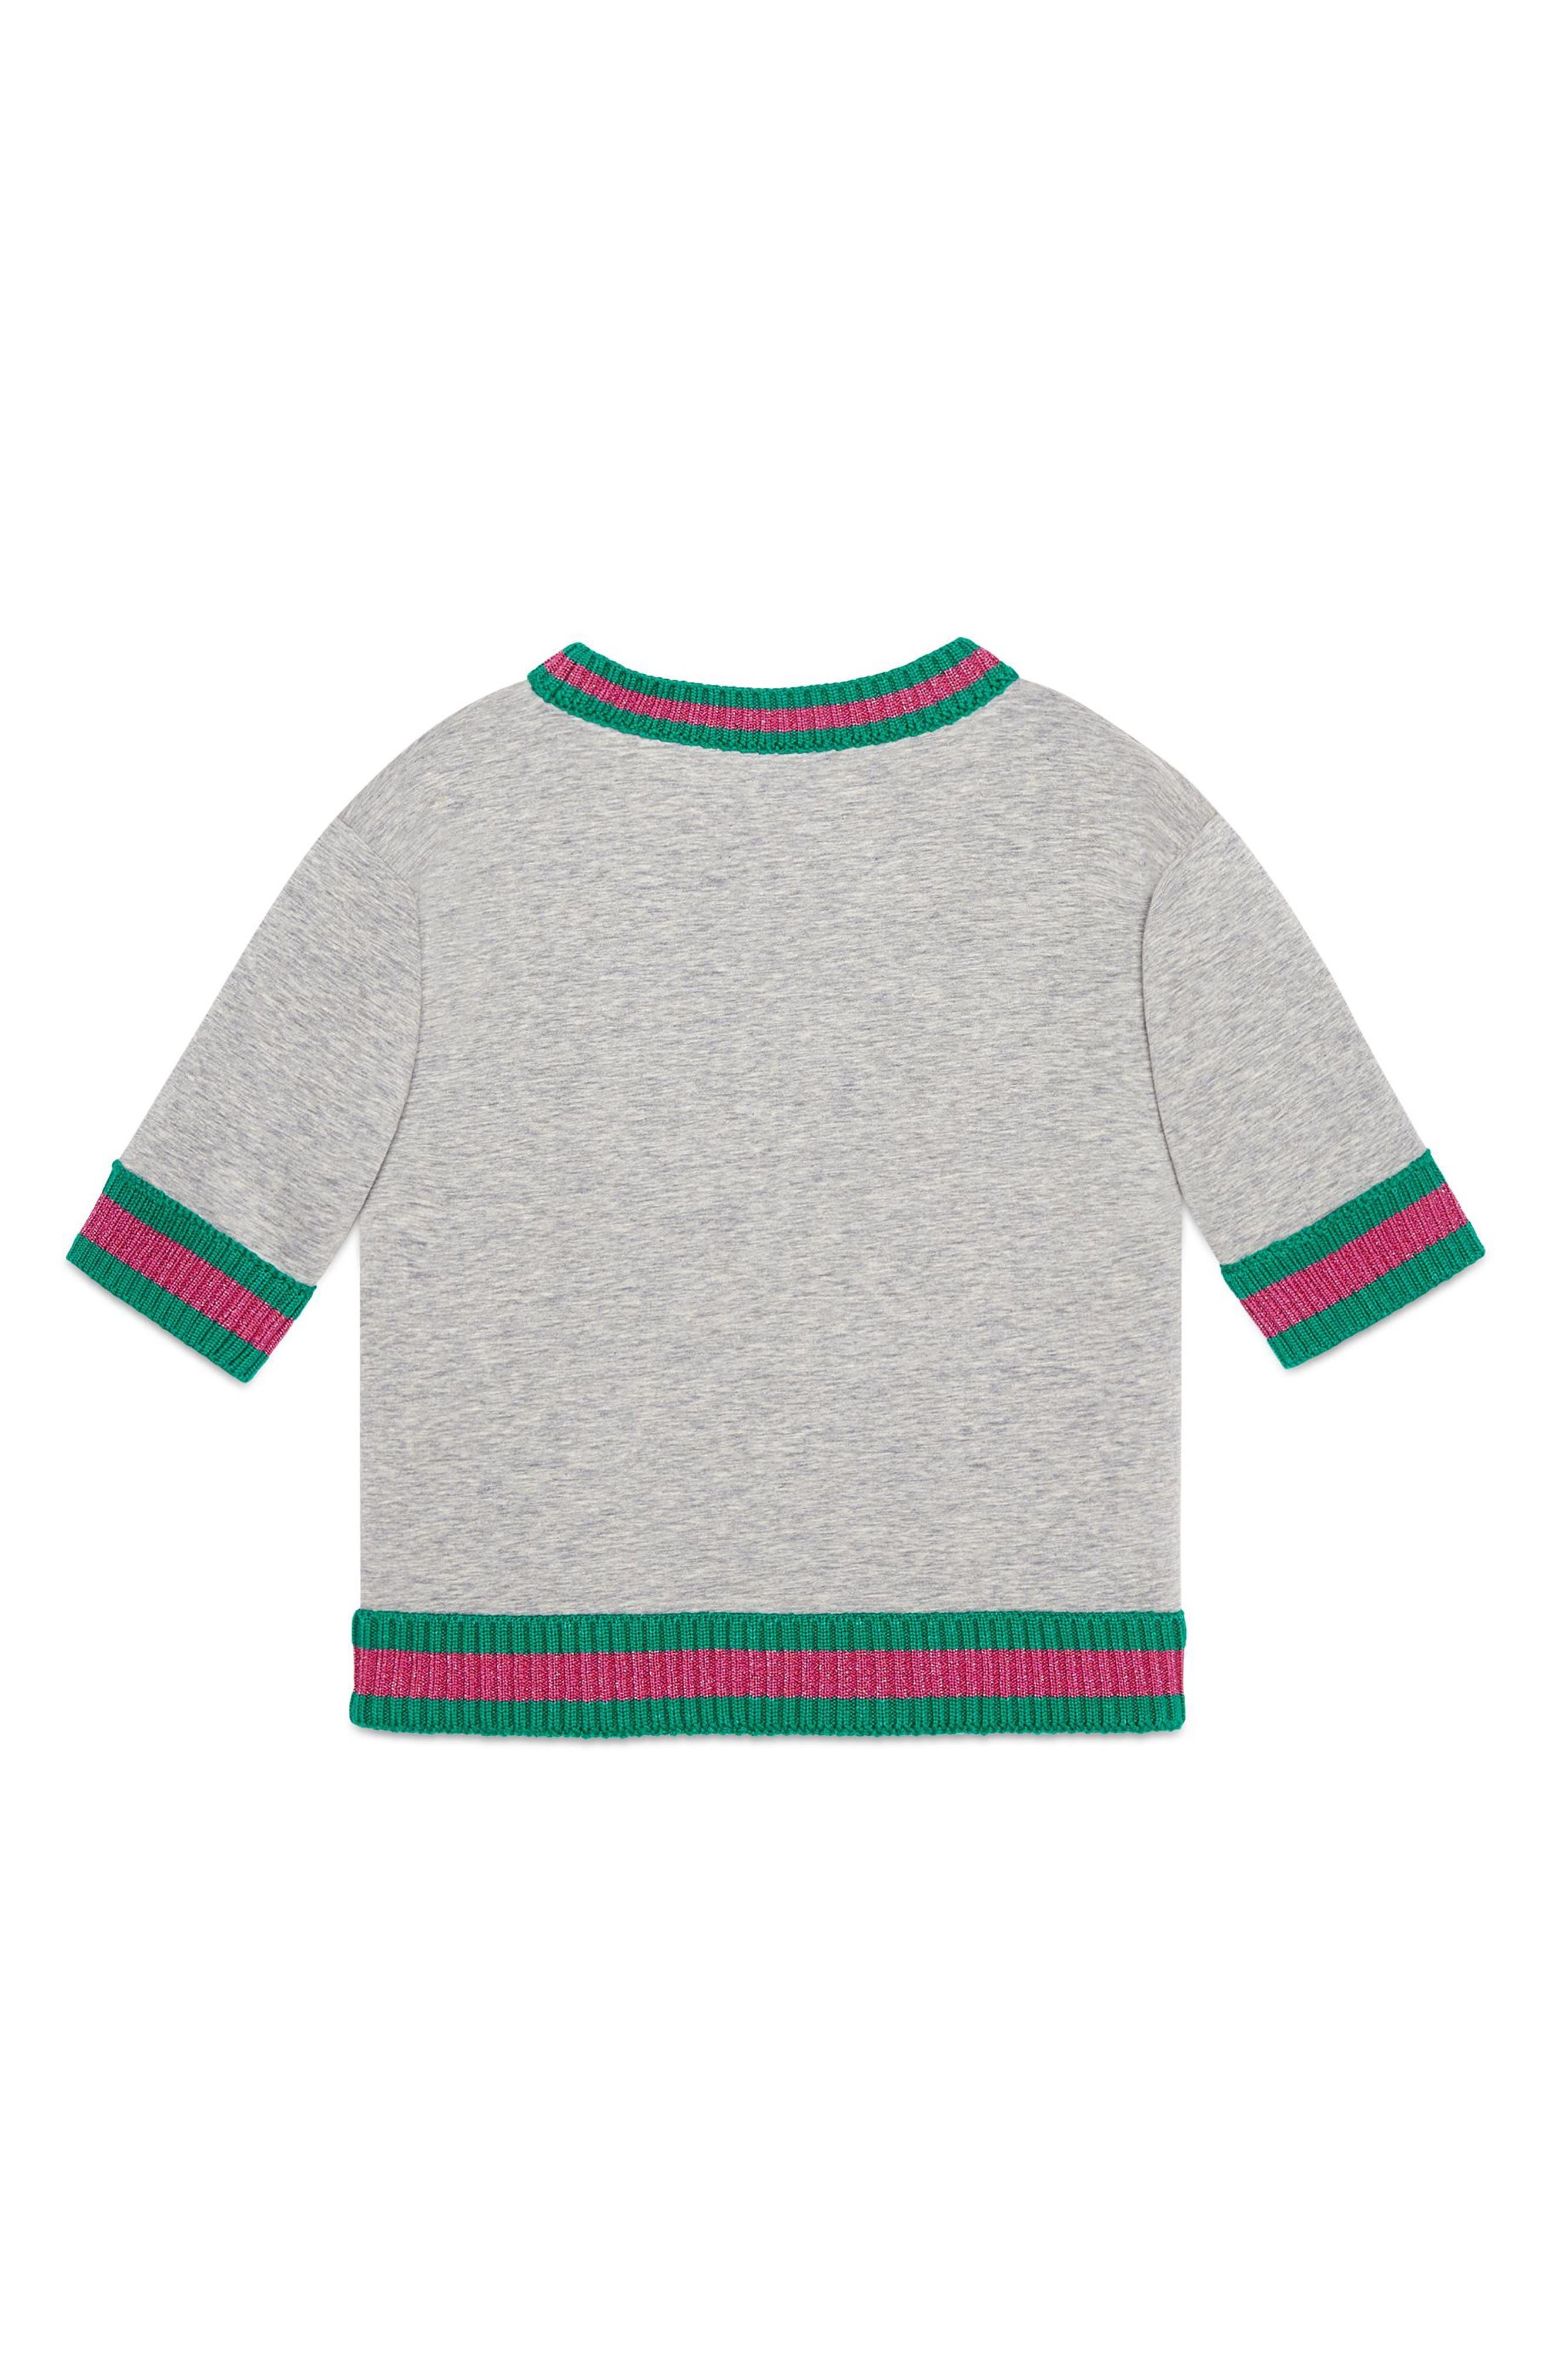 Graphic Sweatshirt,                             Alternate thumbnail 2, color,                             Grey Multi